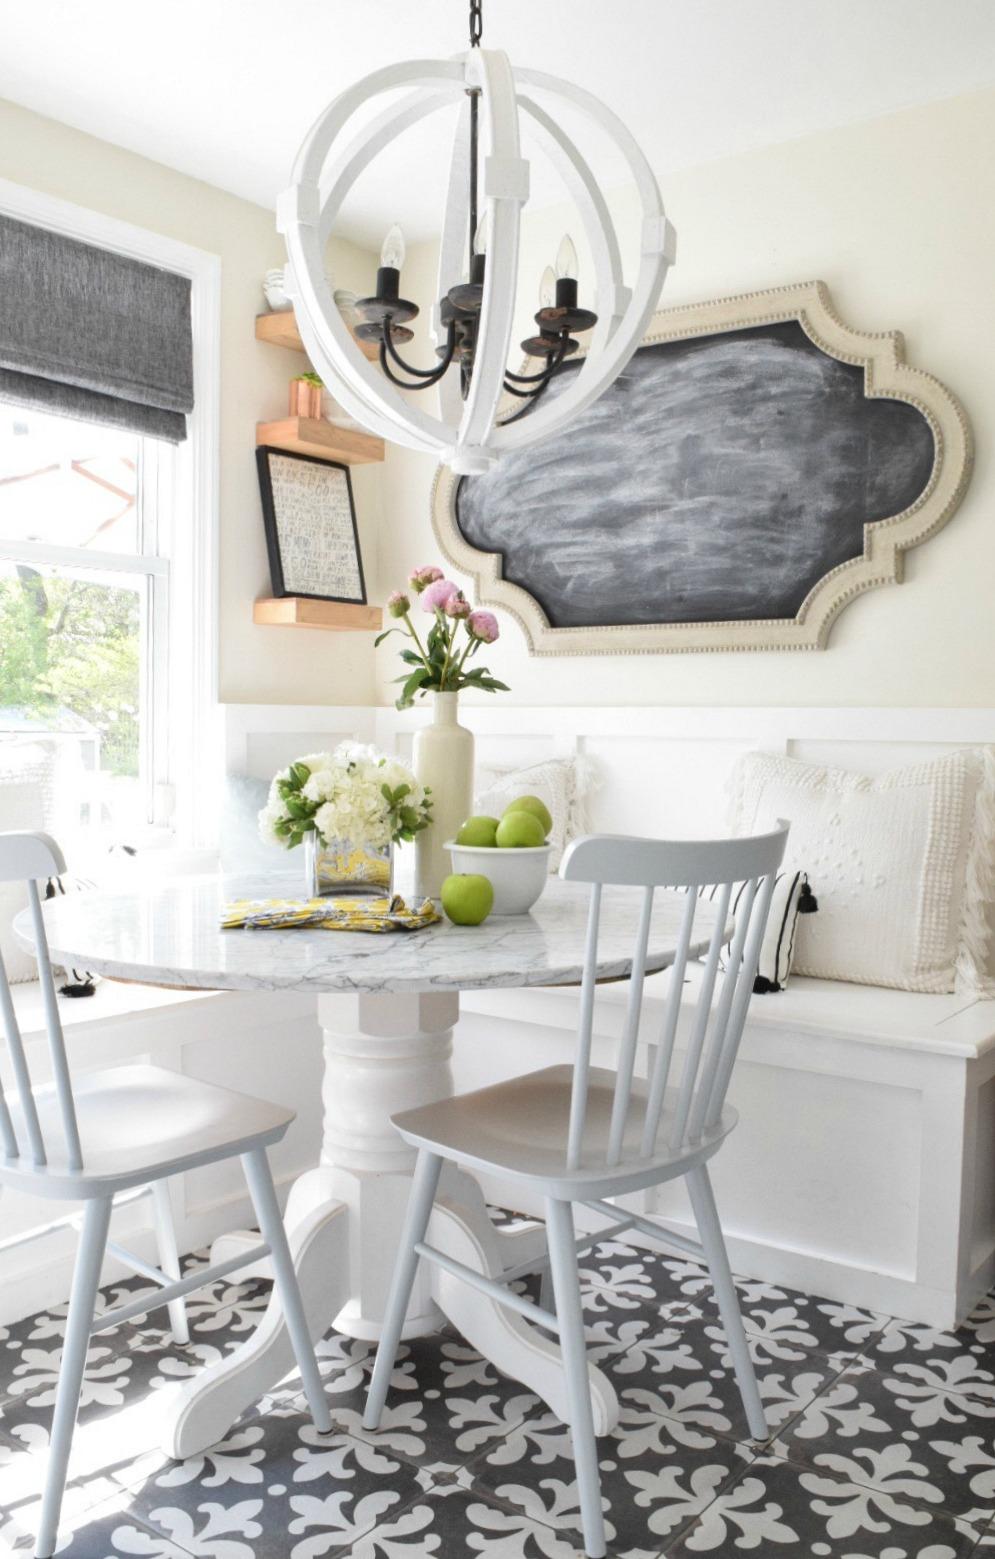 Kitchen Art- 10 Ideas for Art in the Kitchen - Nesting ...